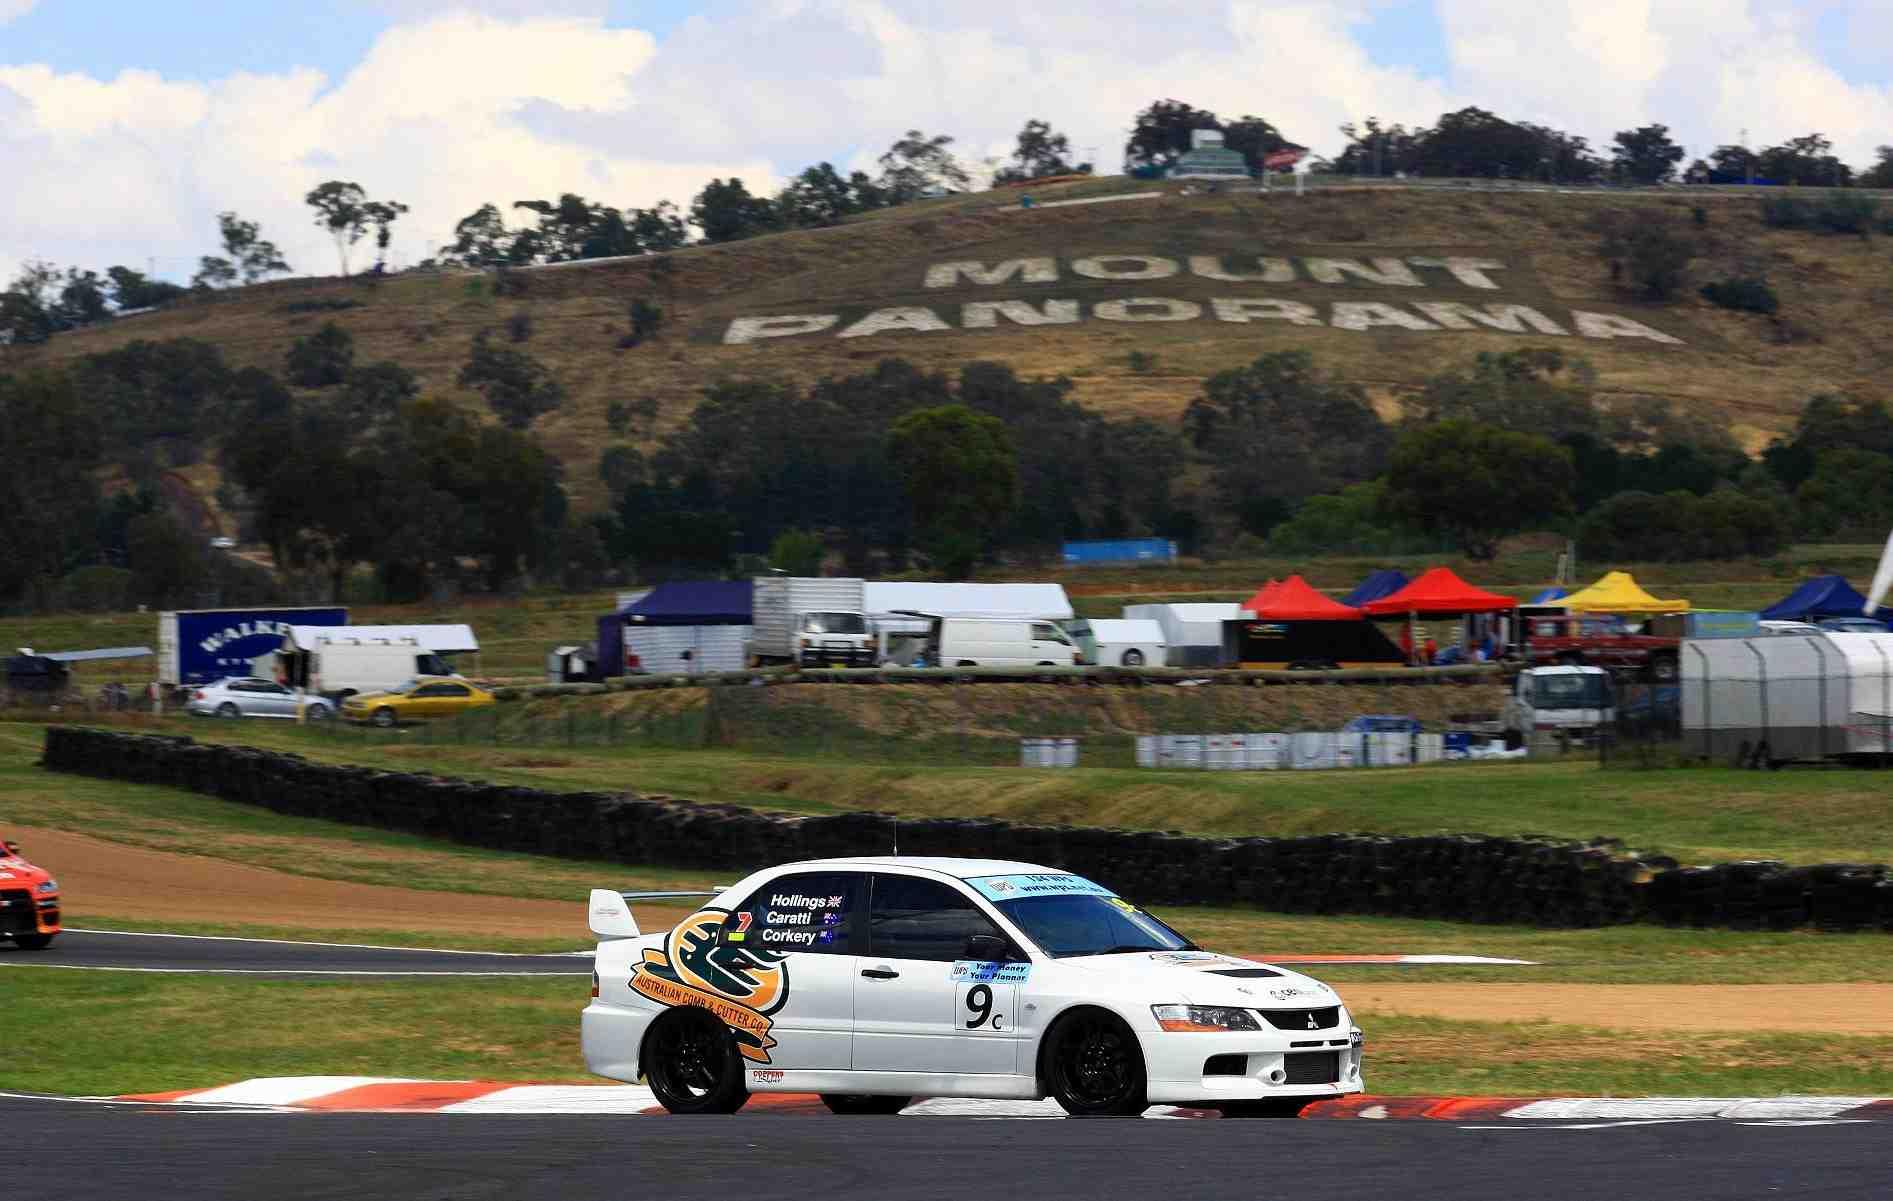 Third major race confirmed for Bathurst